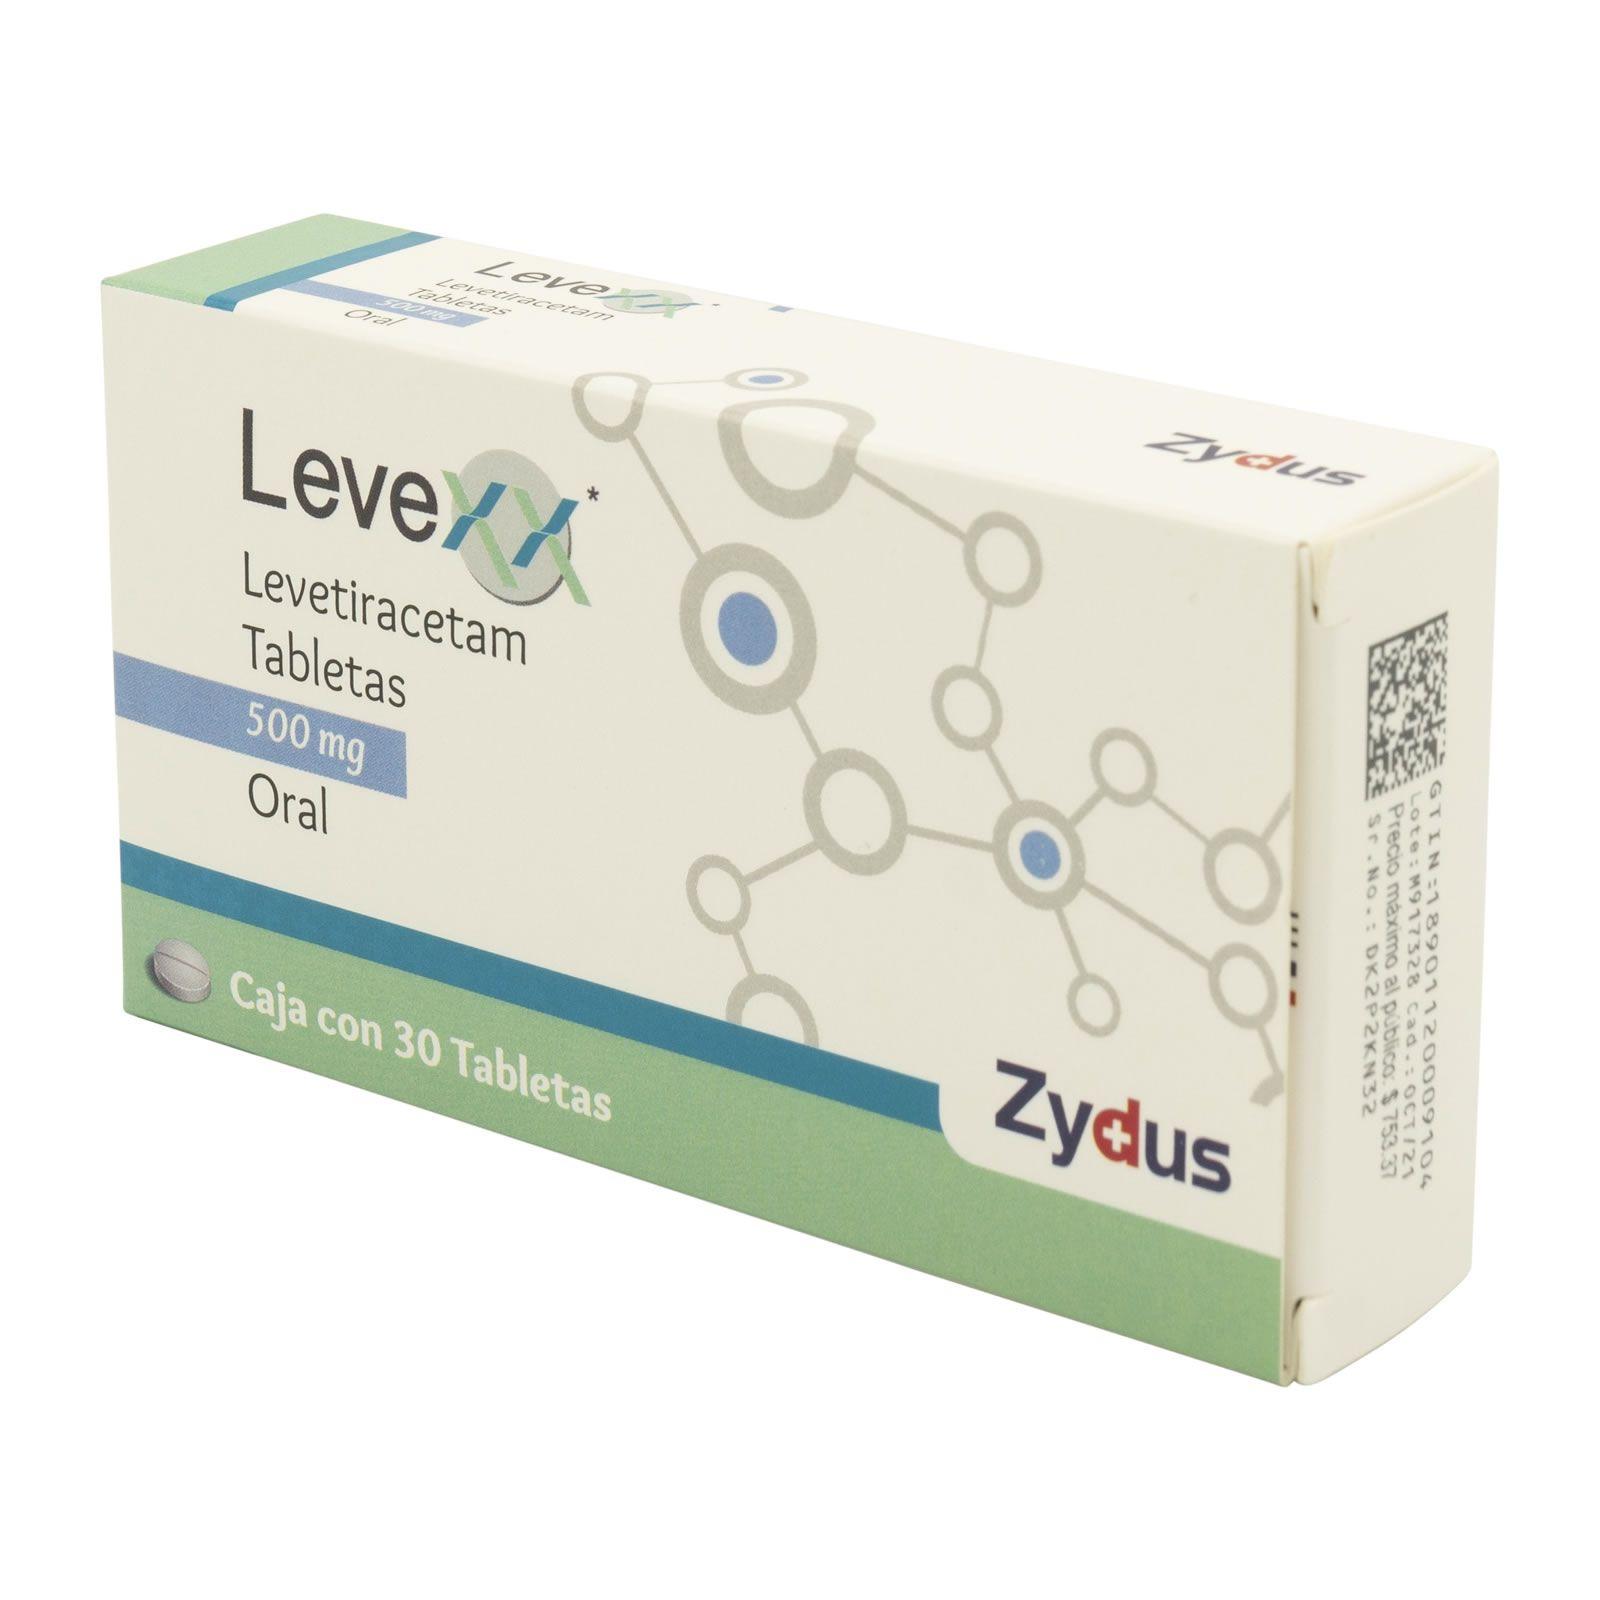 Comprar Levexx 500 Mg Caja 30 Tabletas